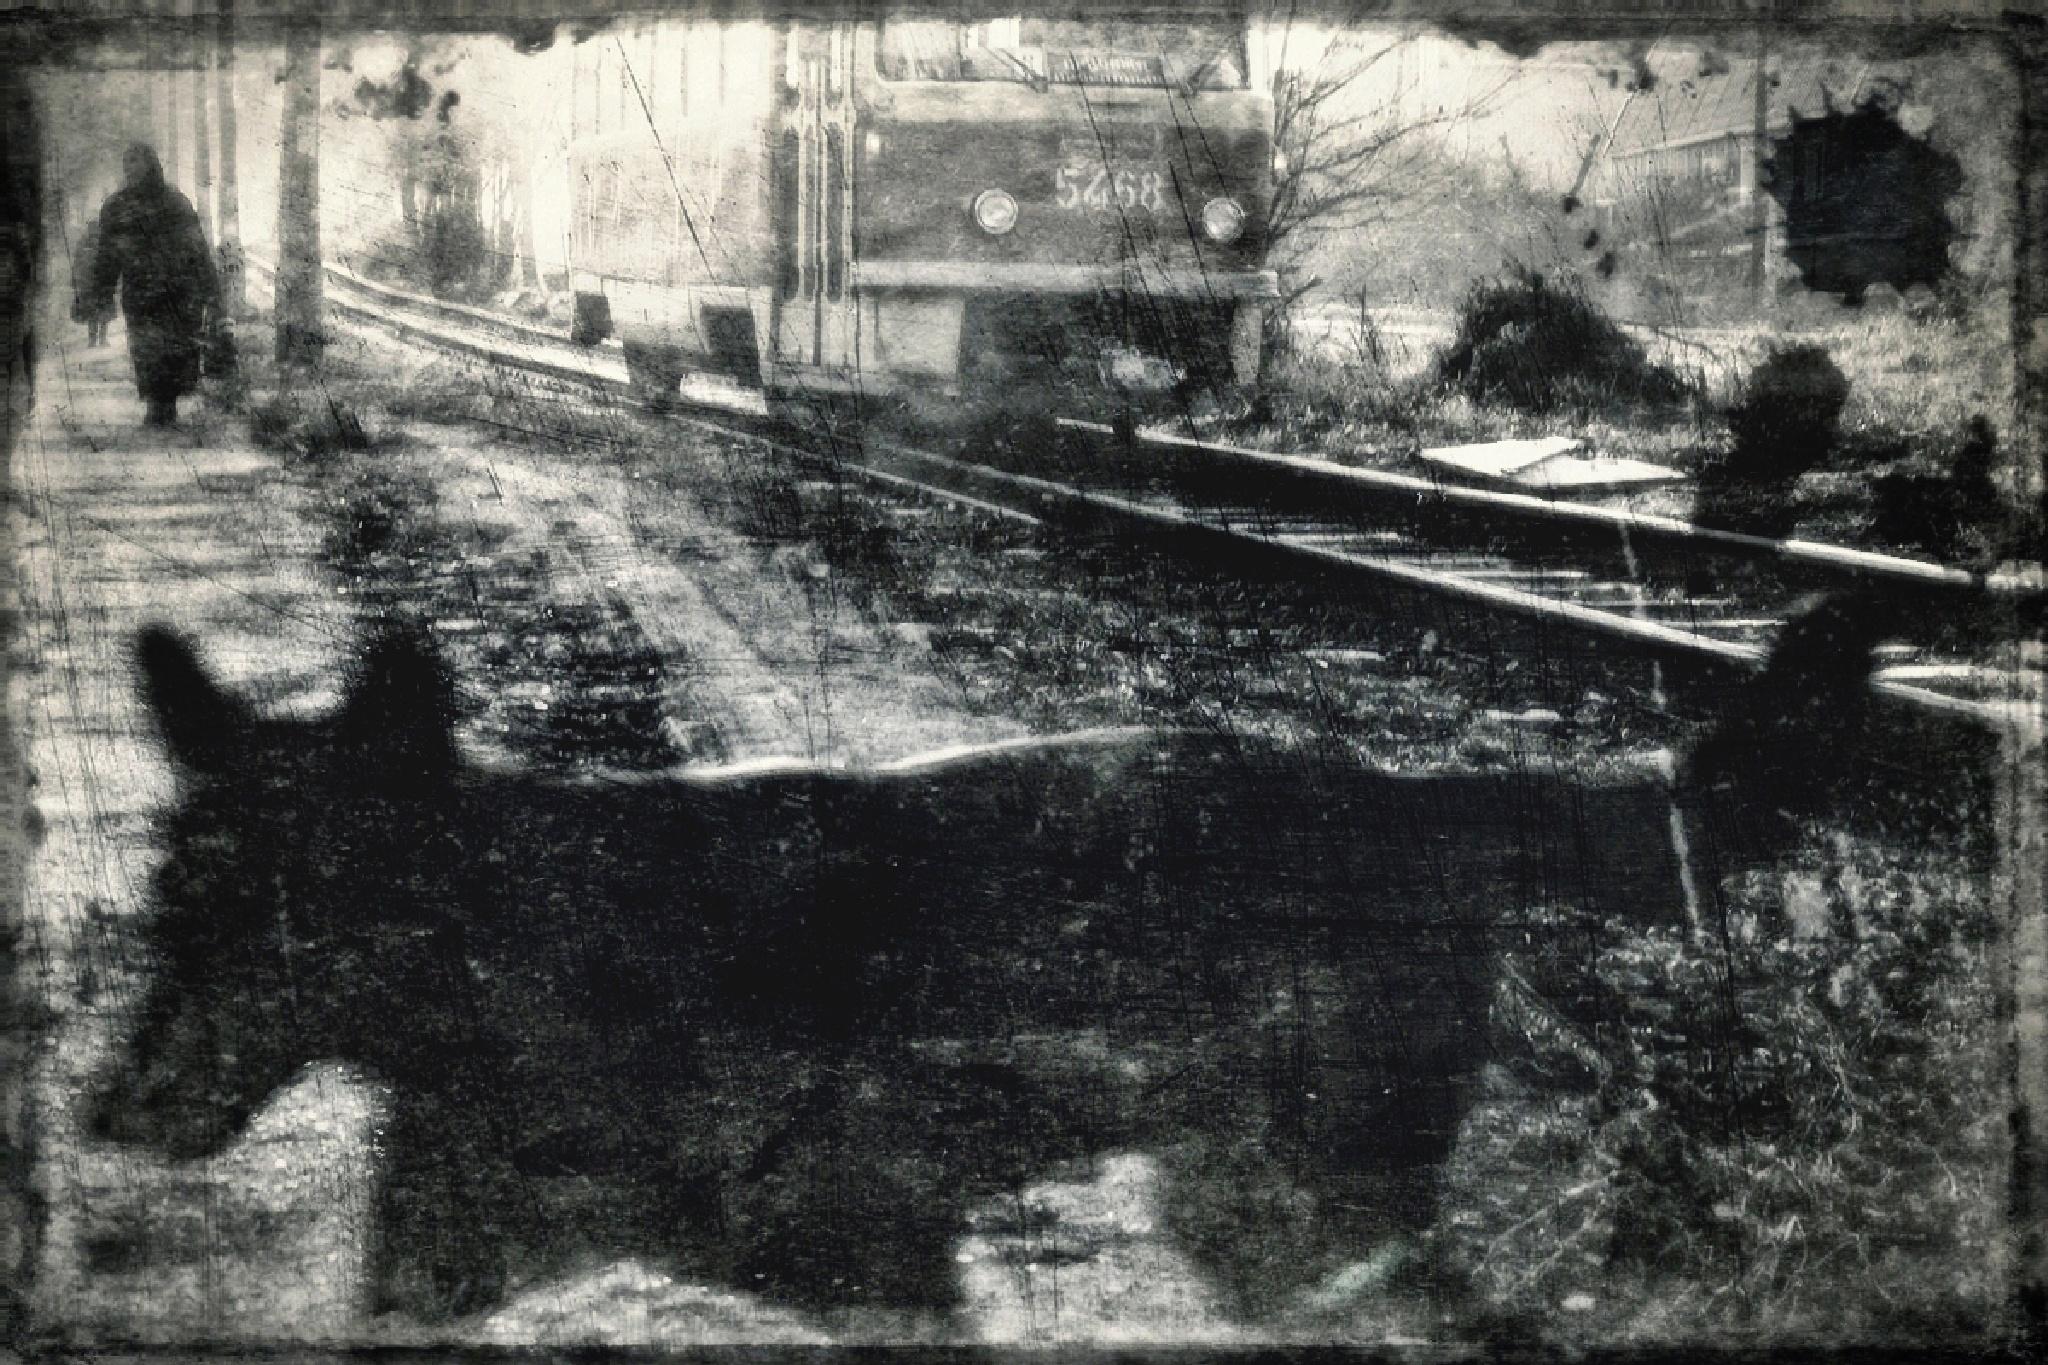 old tram by Bobbyus